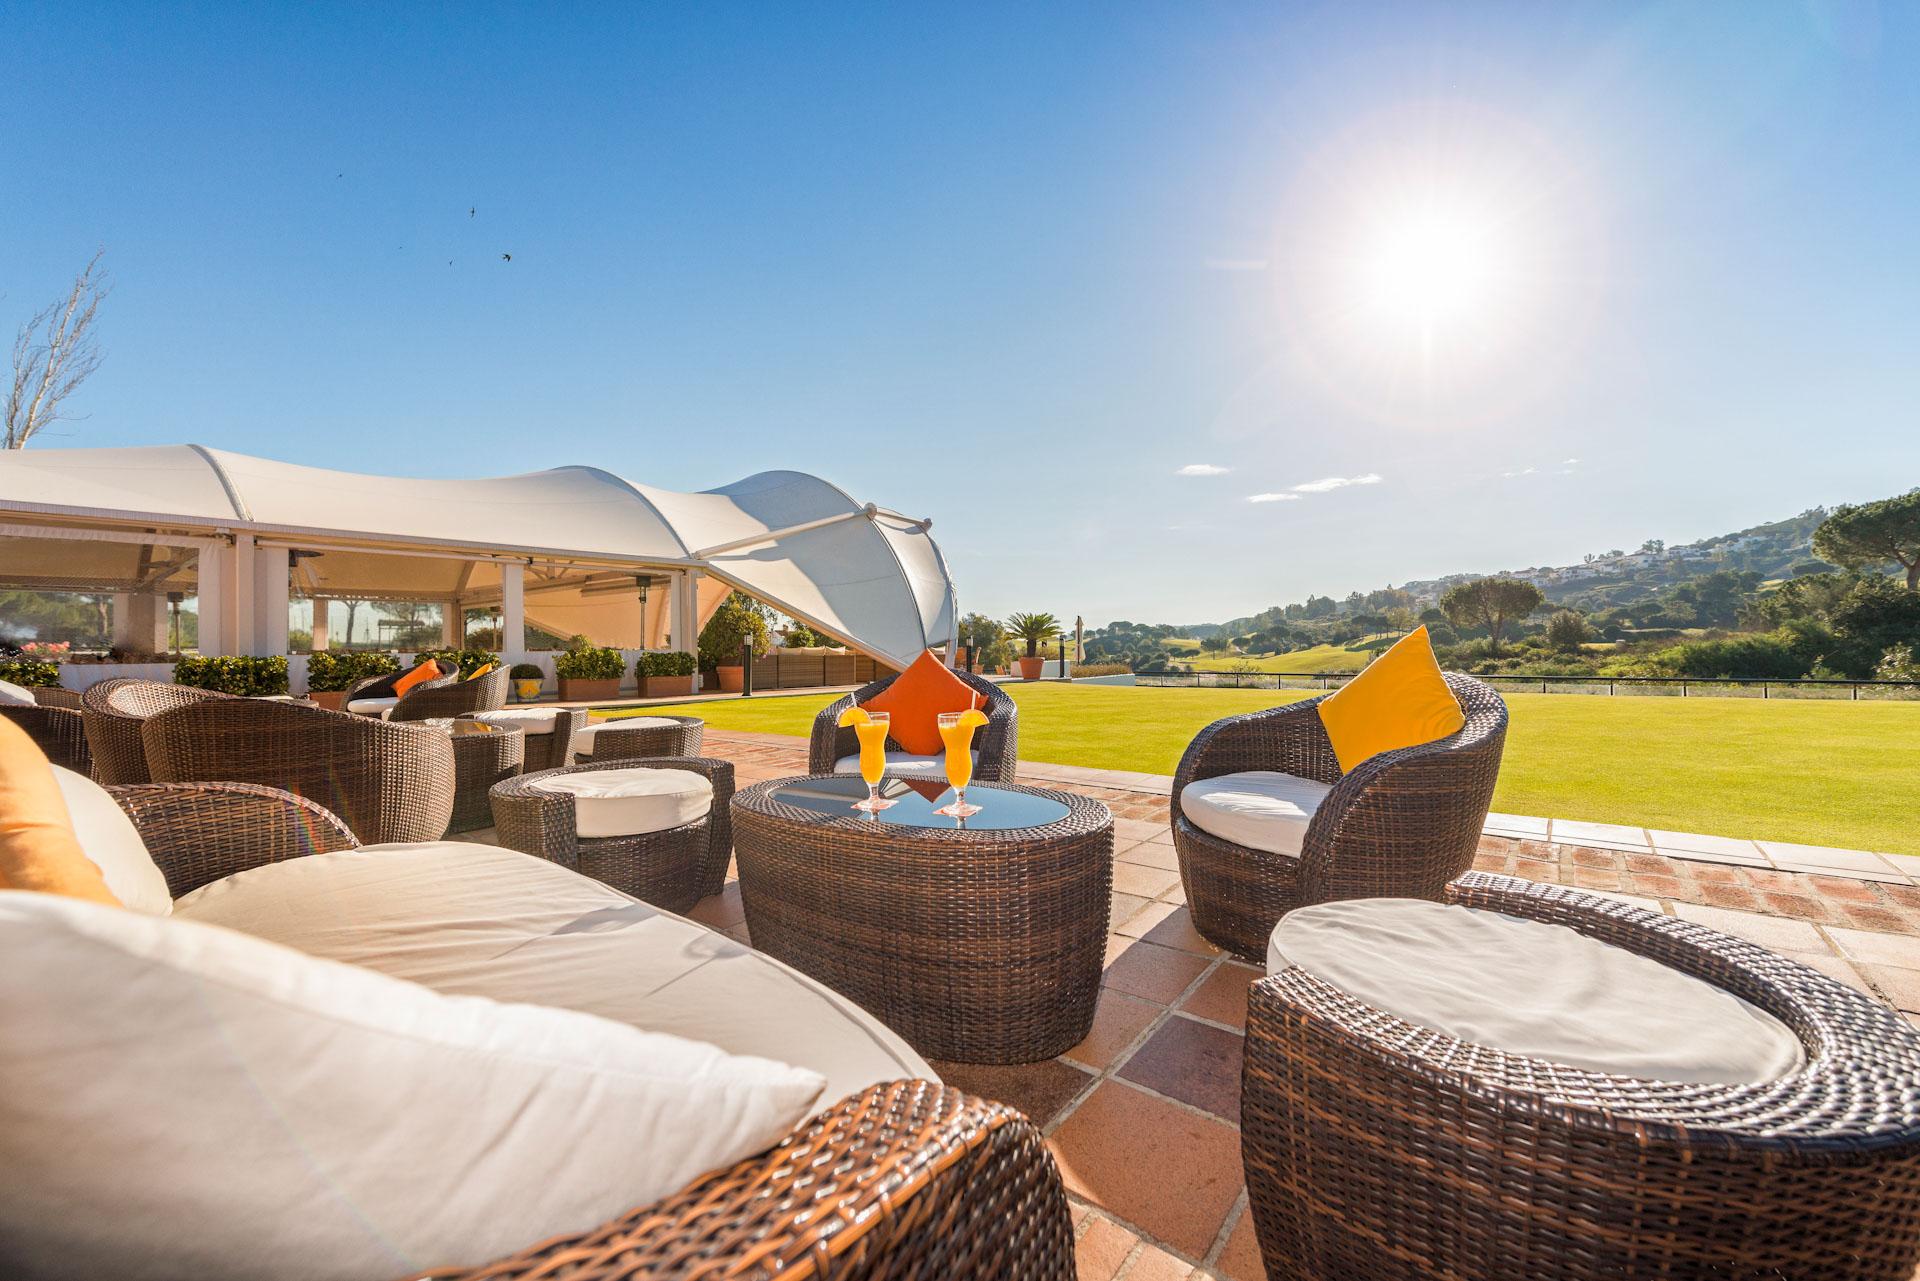 La Cala - Campo Europa Golf Course-17172